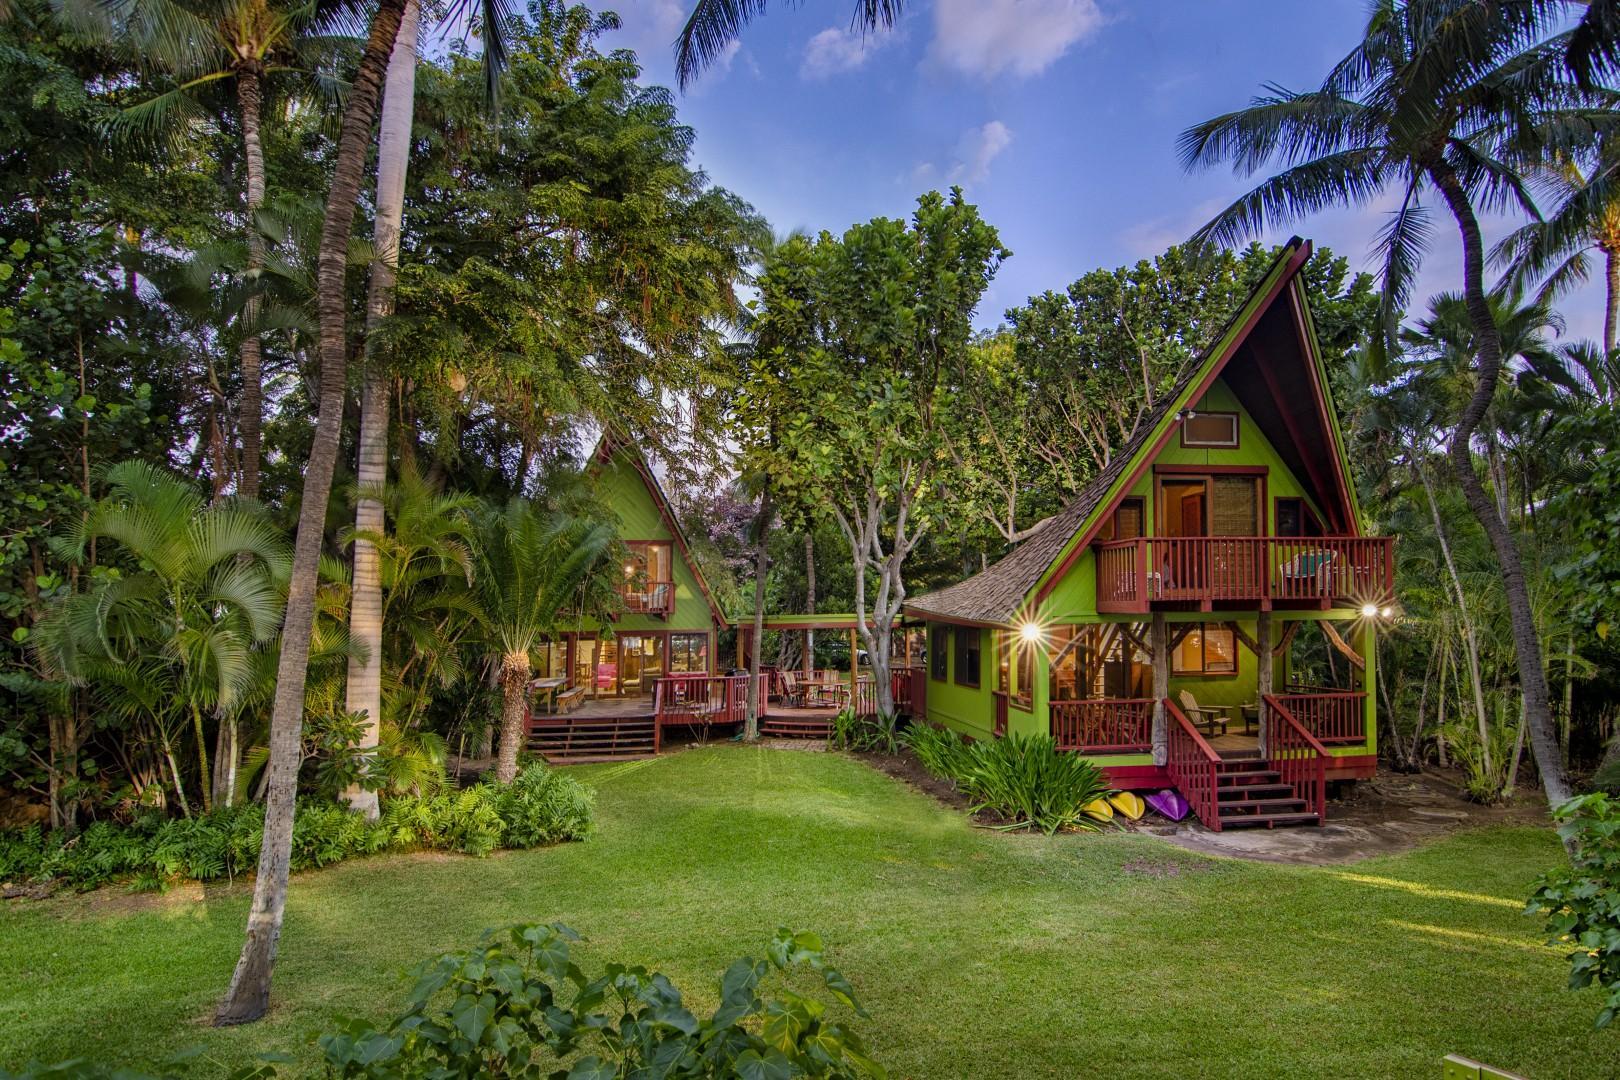 1. Welcome to Hui Pu- Wailea Bay